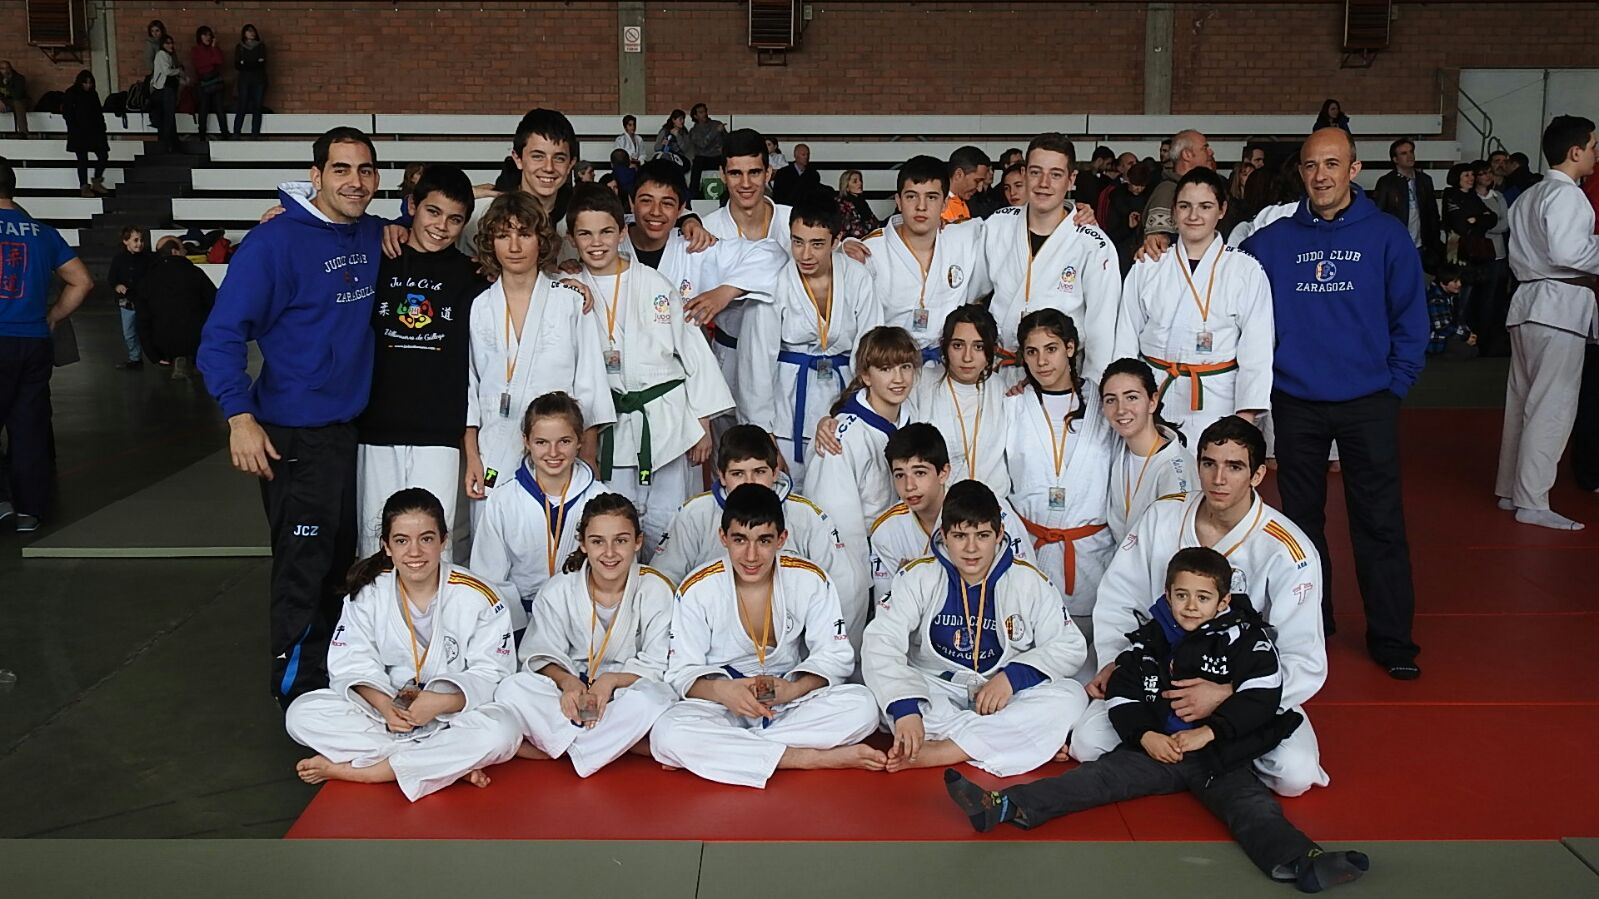 1º Fase Cto. de Aragón Infantil-Cadete 28/02/16